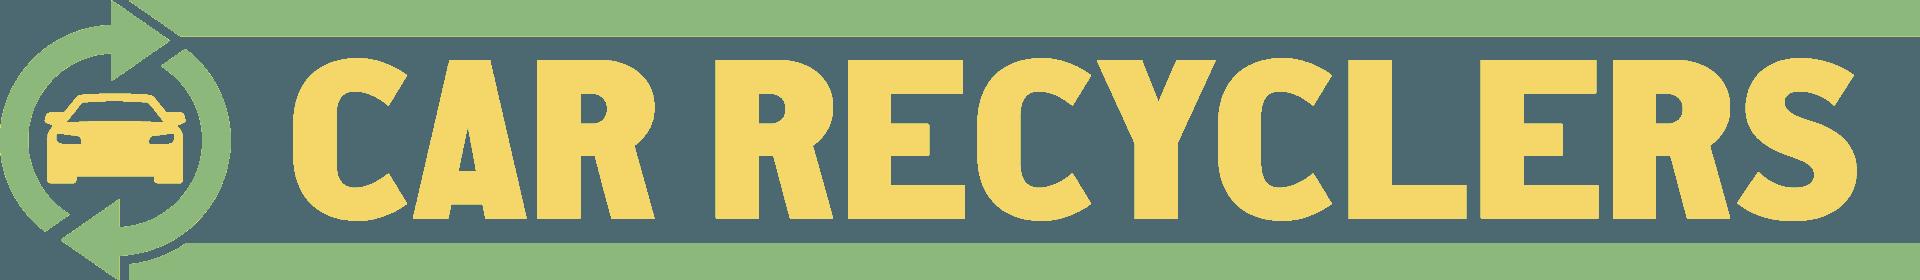 car recycles logo